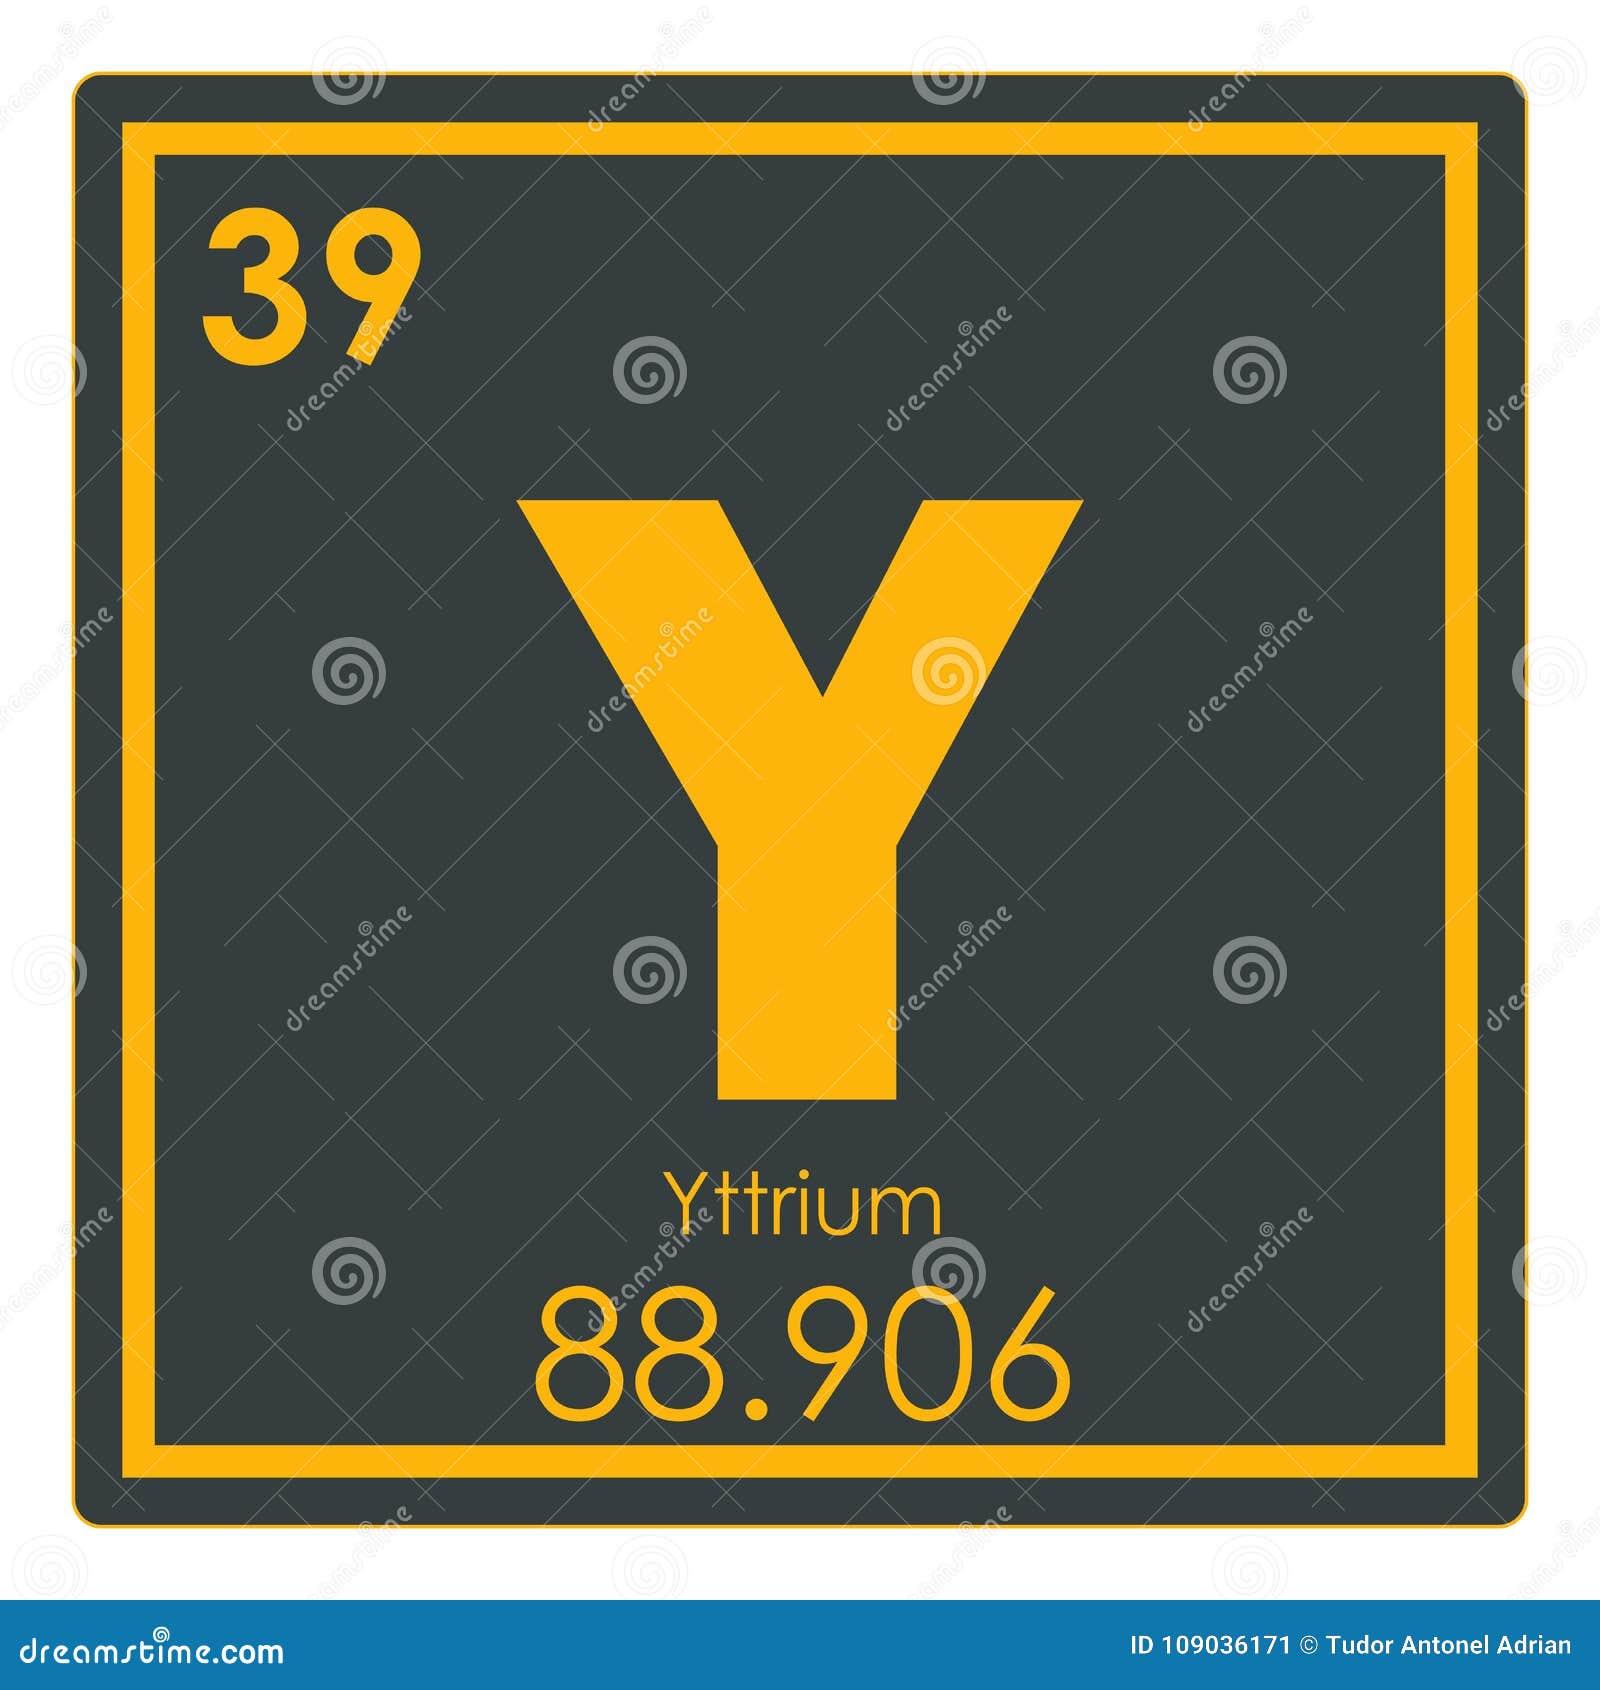 Yttrium chemical element stock illustration illustration of download comp urtaz Choice Image